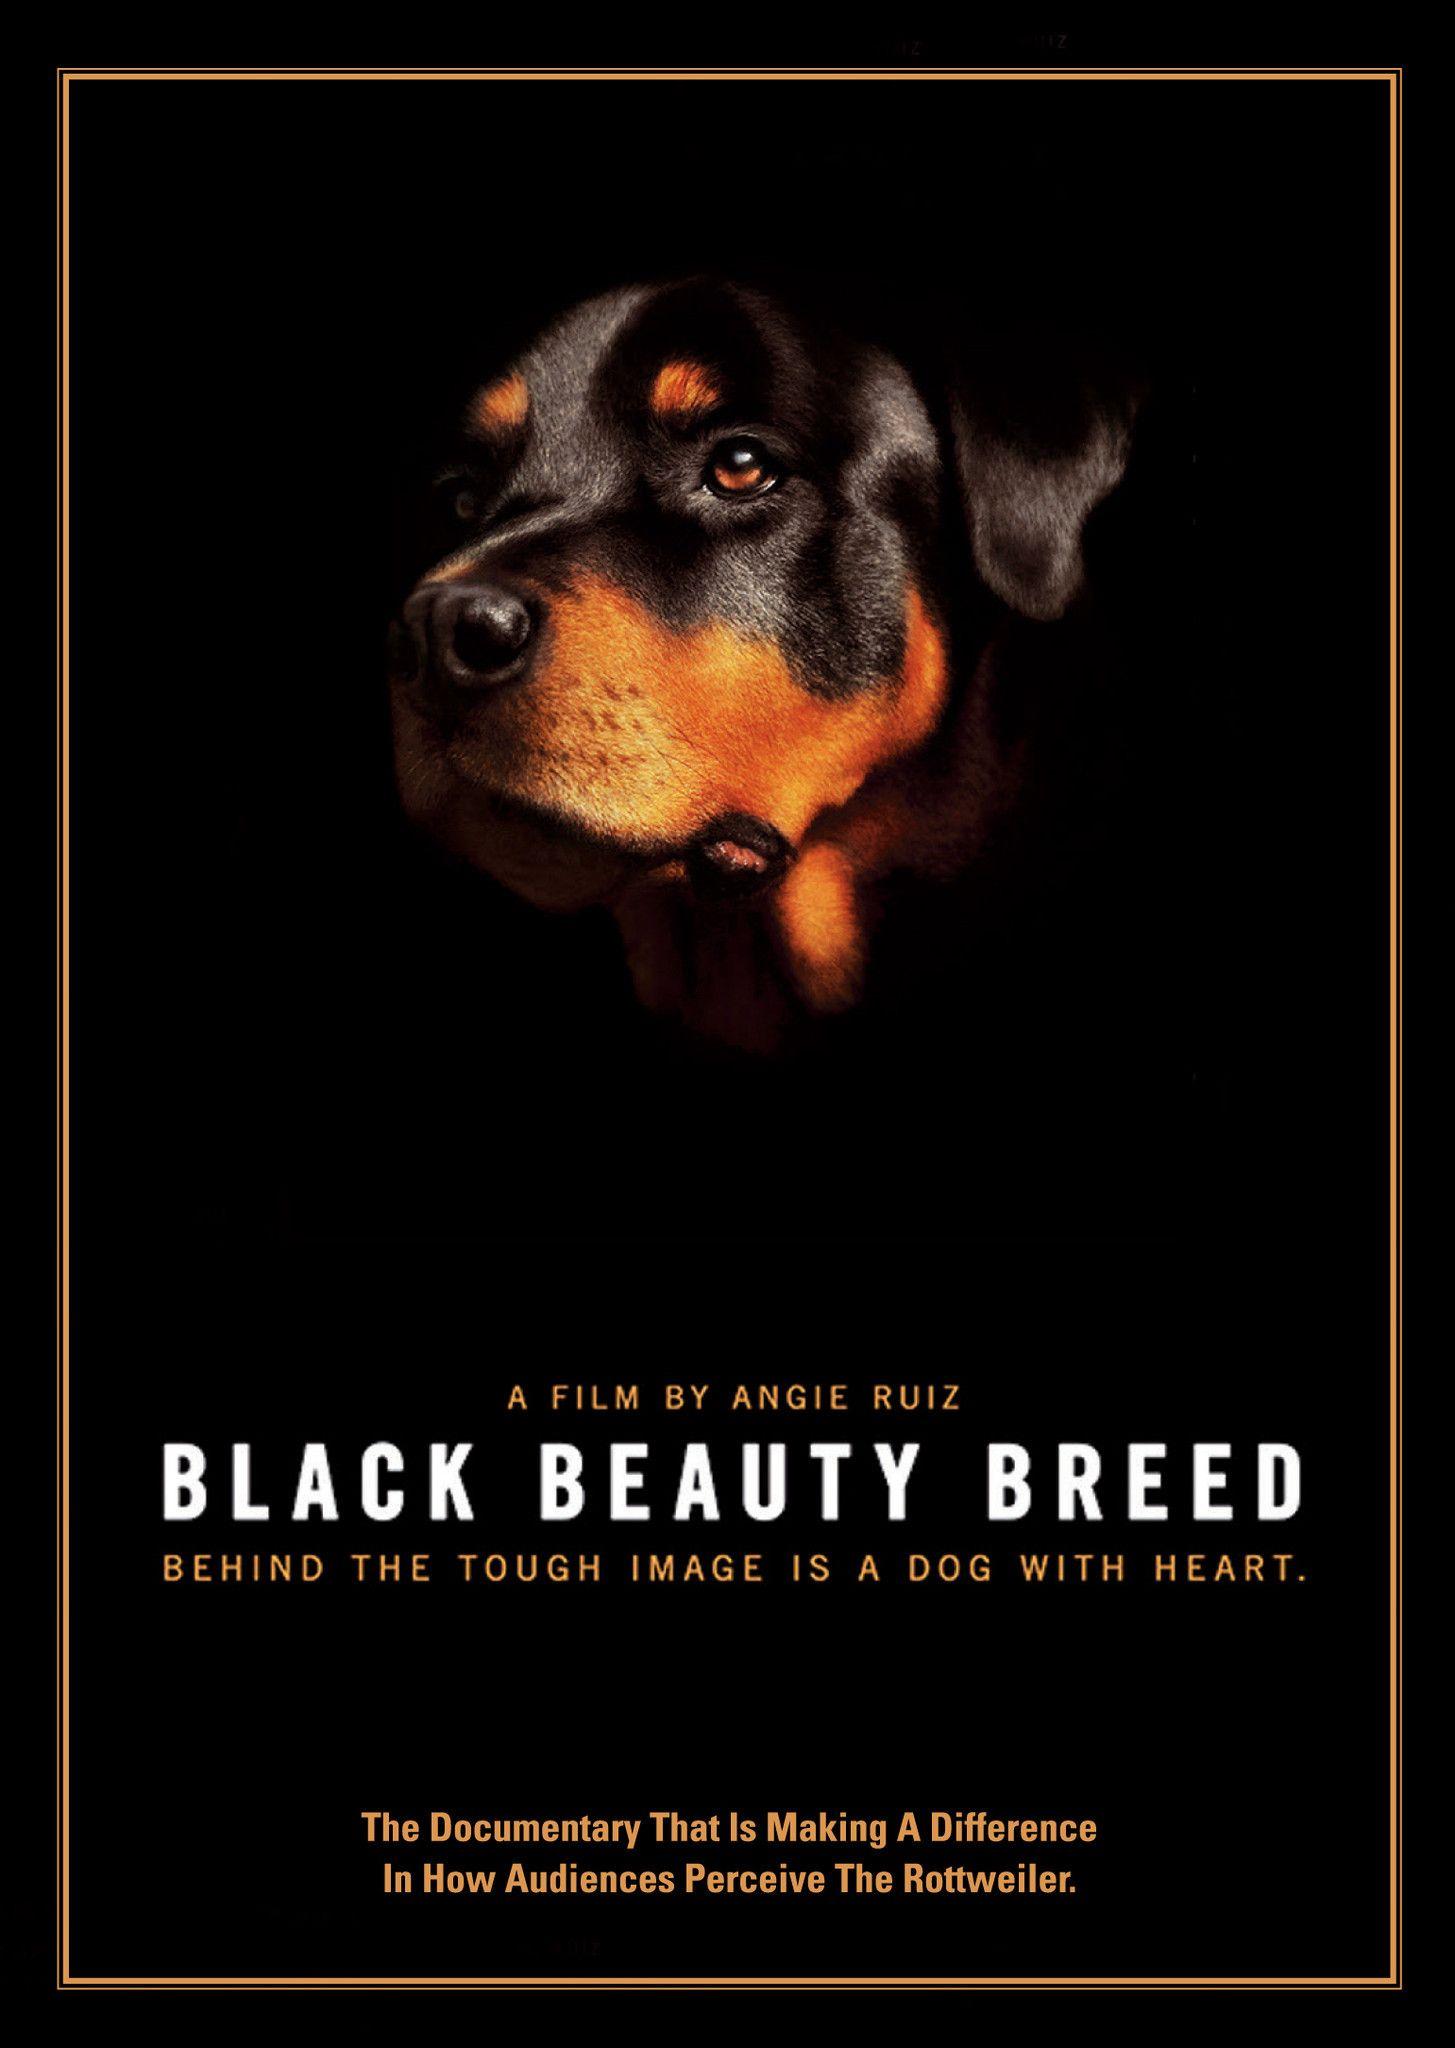 Black Beauty Breed DVD Black beauties, Breeds